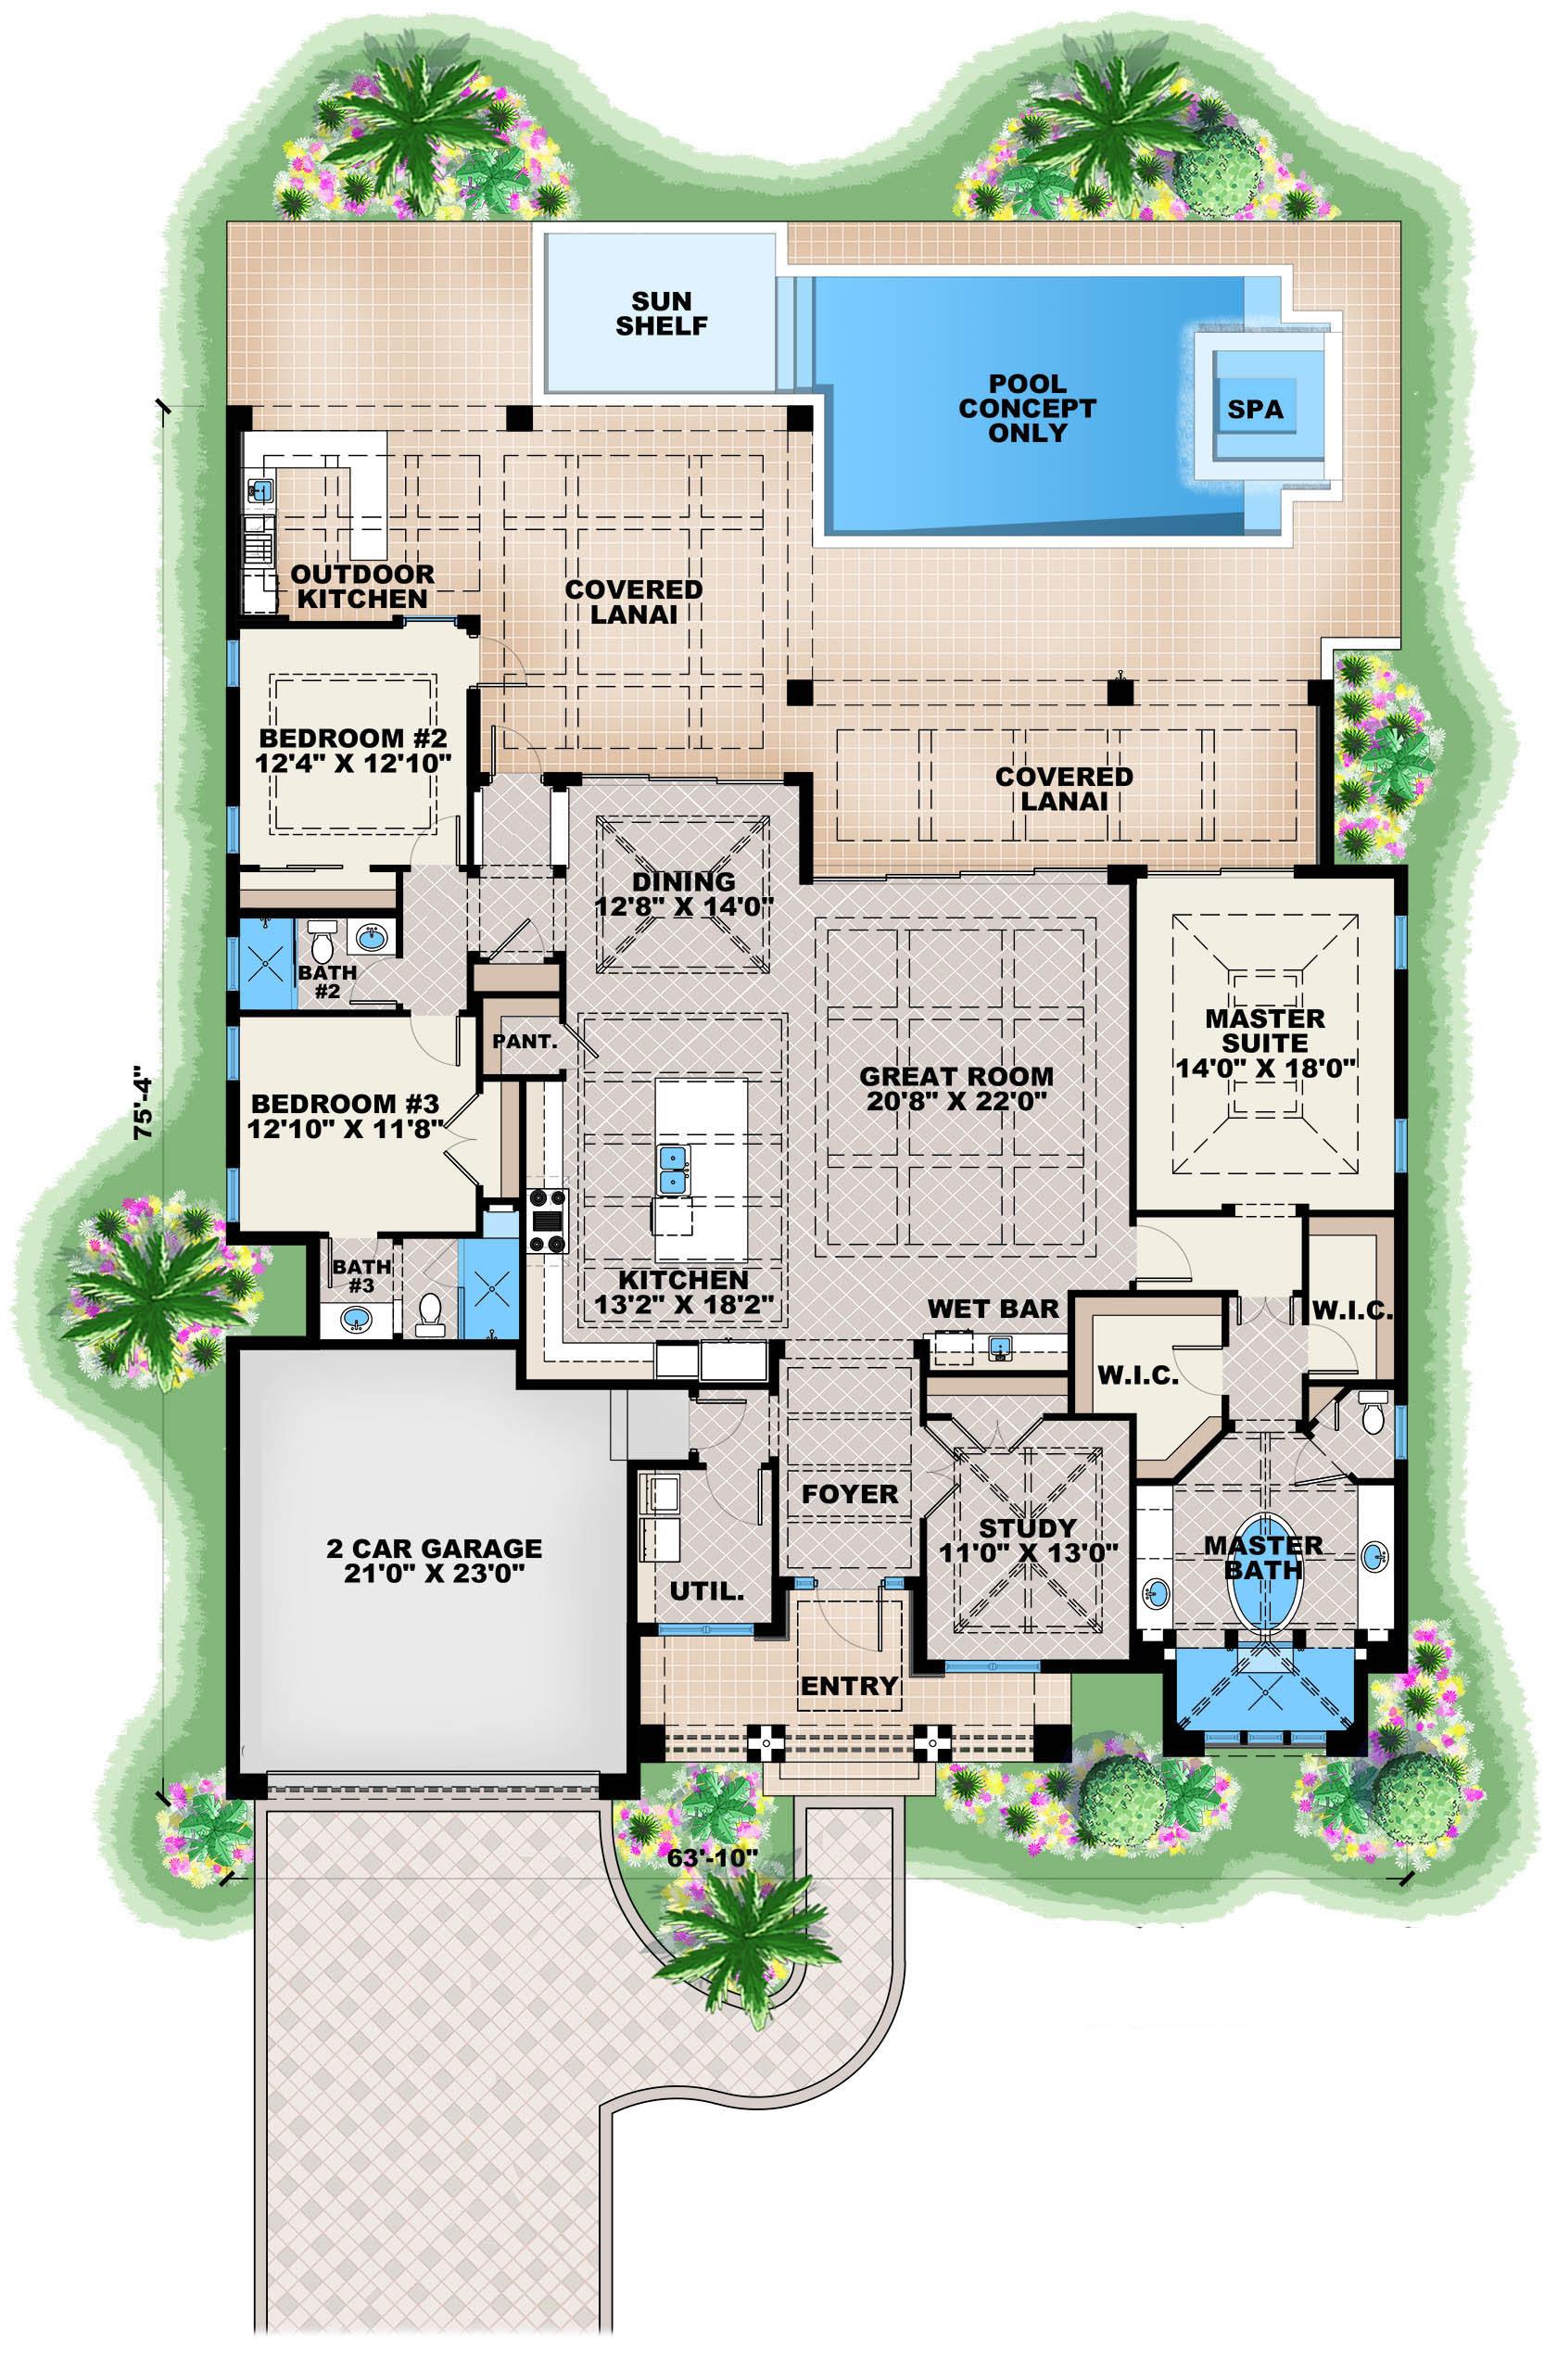 Contemporary House Plan 1751134: 3 Bedrm, 2684 Sq Ft Home Plan - Dramatic Contemporary Home Plan 90232PD Architectural Designs HousePlans